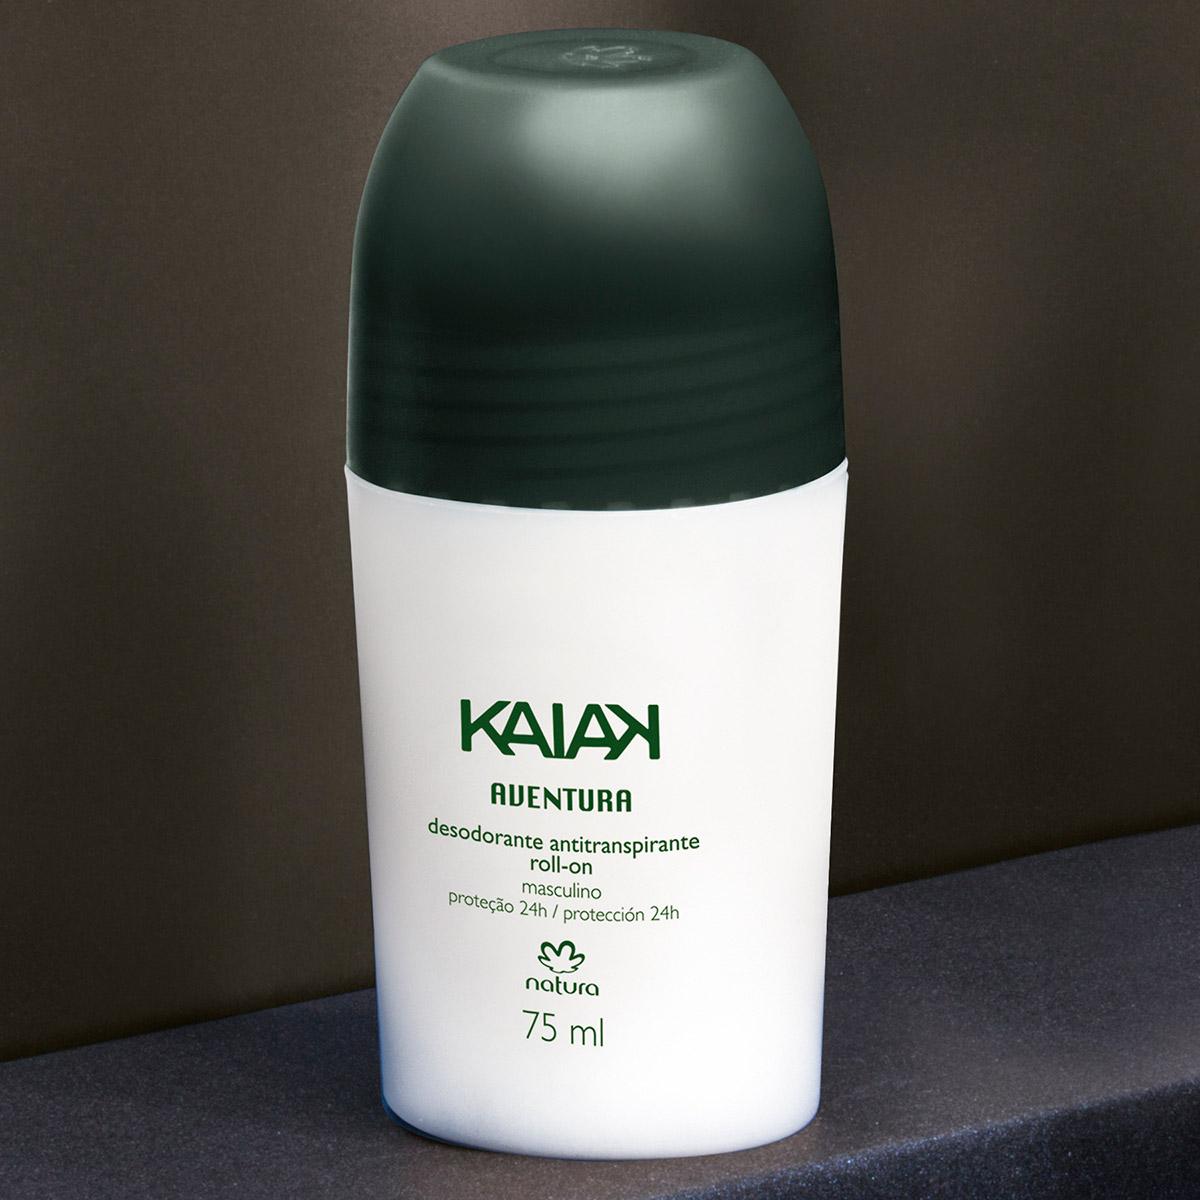 Desodorante Antitranspirante Roll-on Kaiak Aventura Masculino  - 75ml - 35673